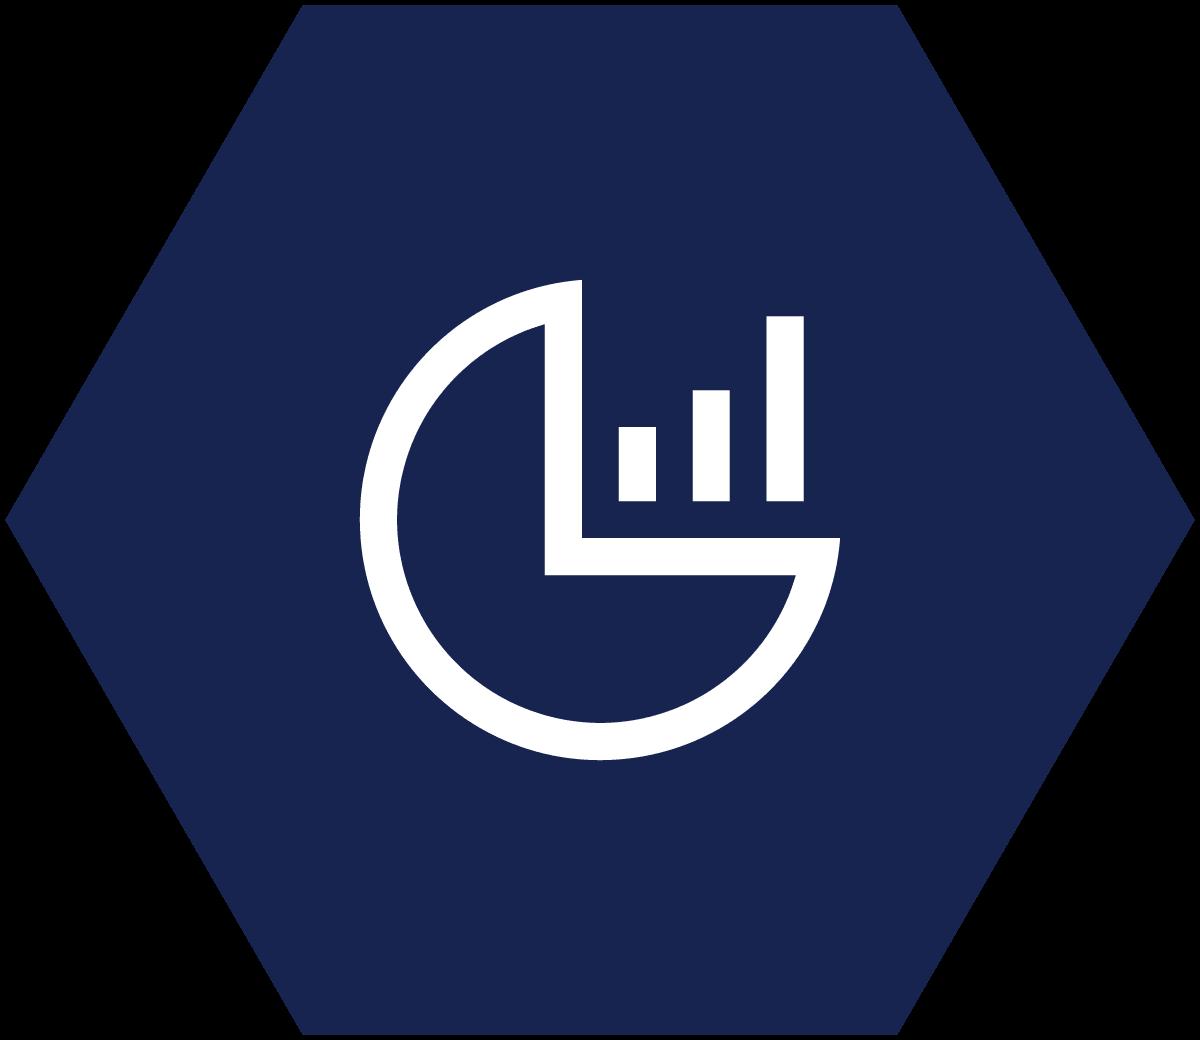 Dynamics 365 for Sales pic logo